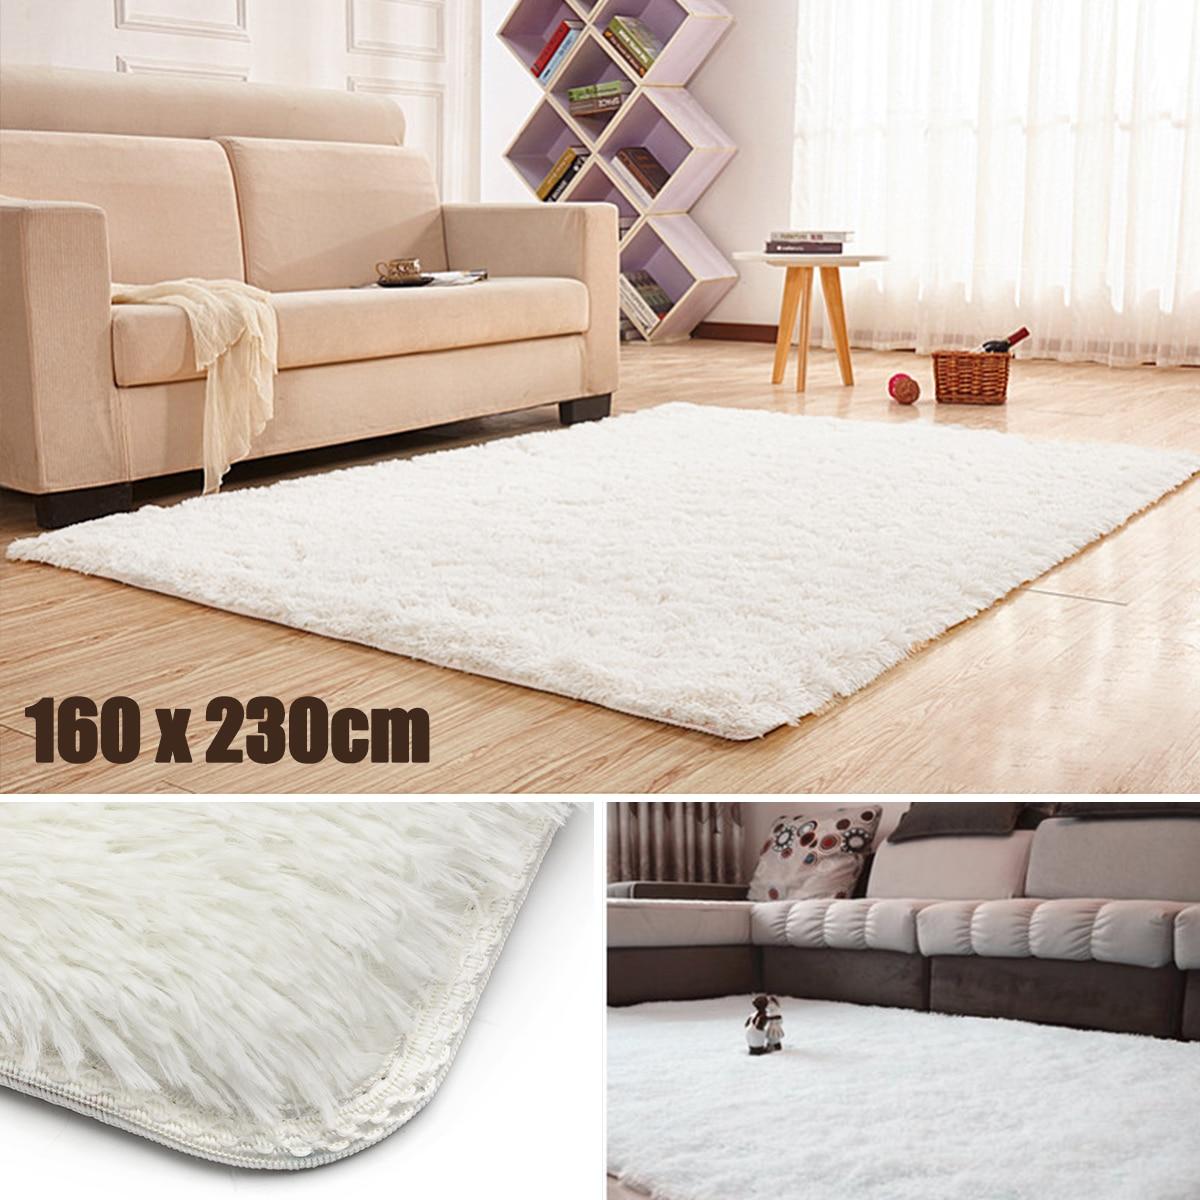 160*230cm Large Shaggy Rugs Silk Carpet Living Room Modern Hotel ...